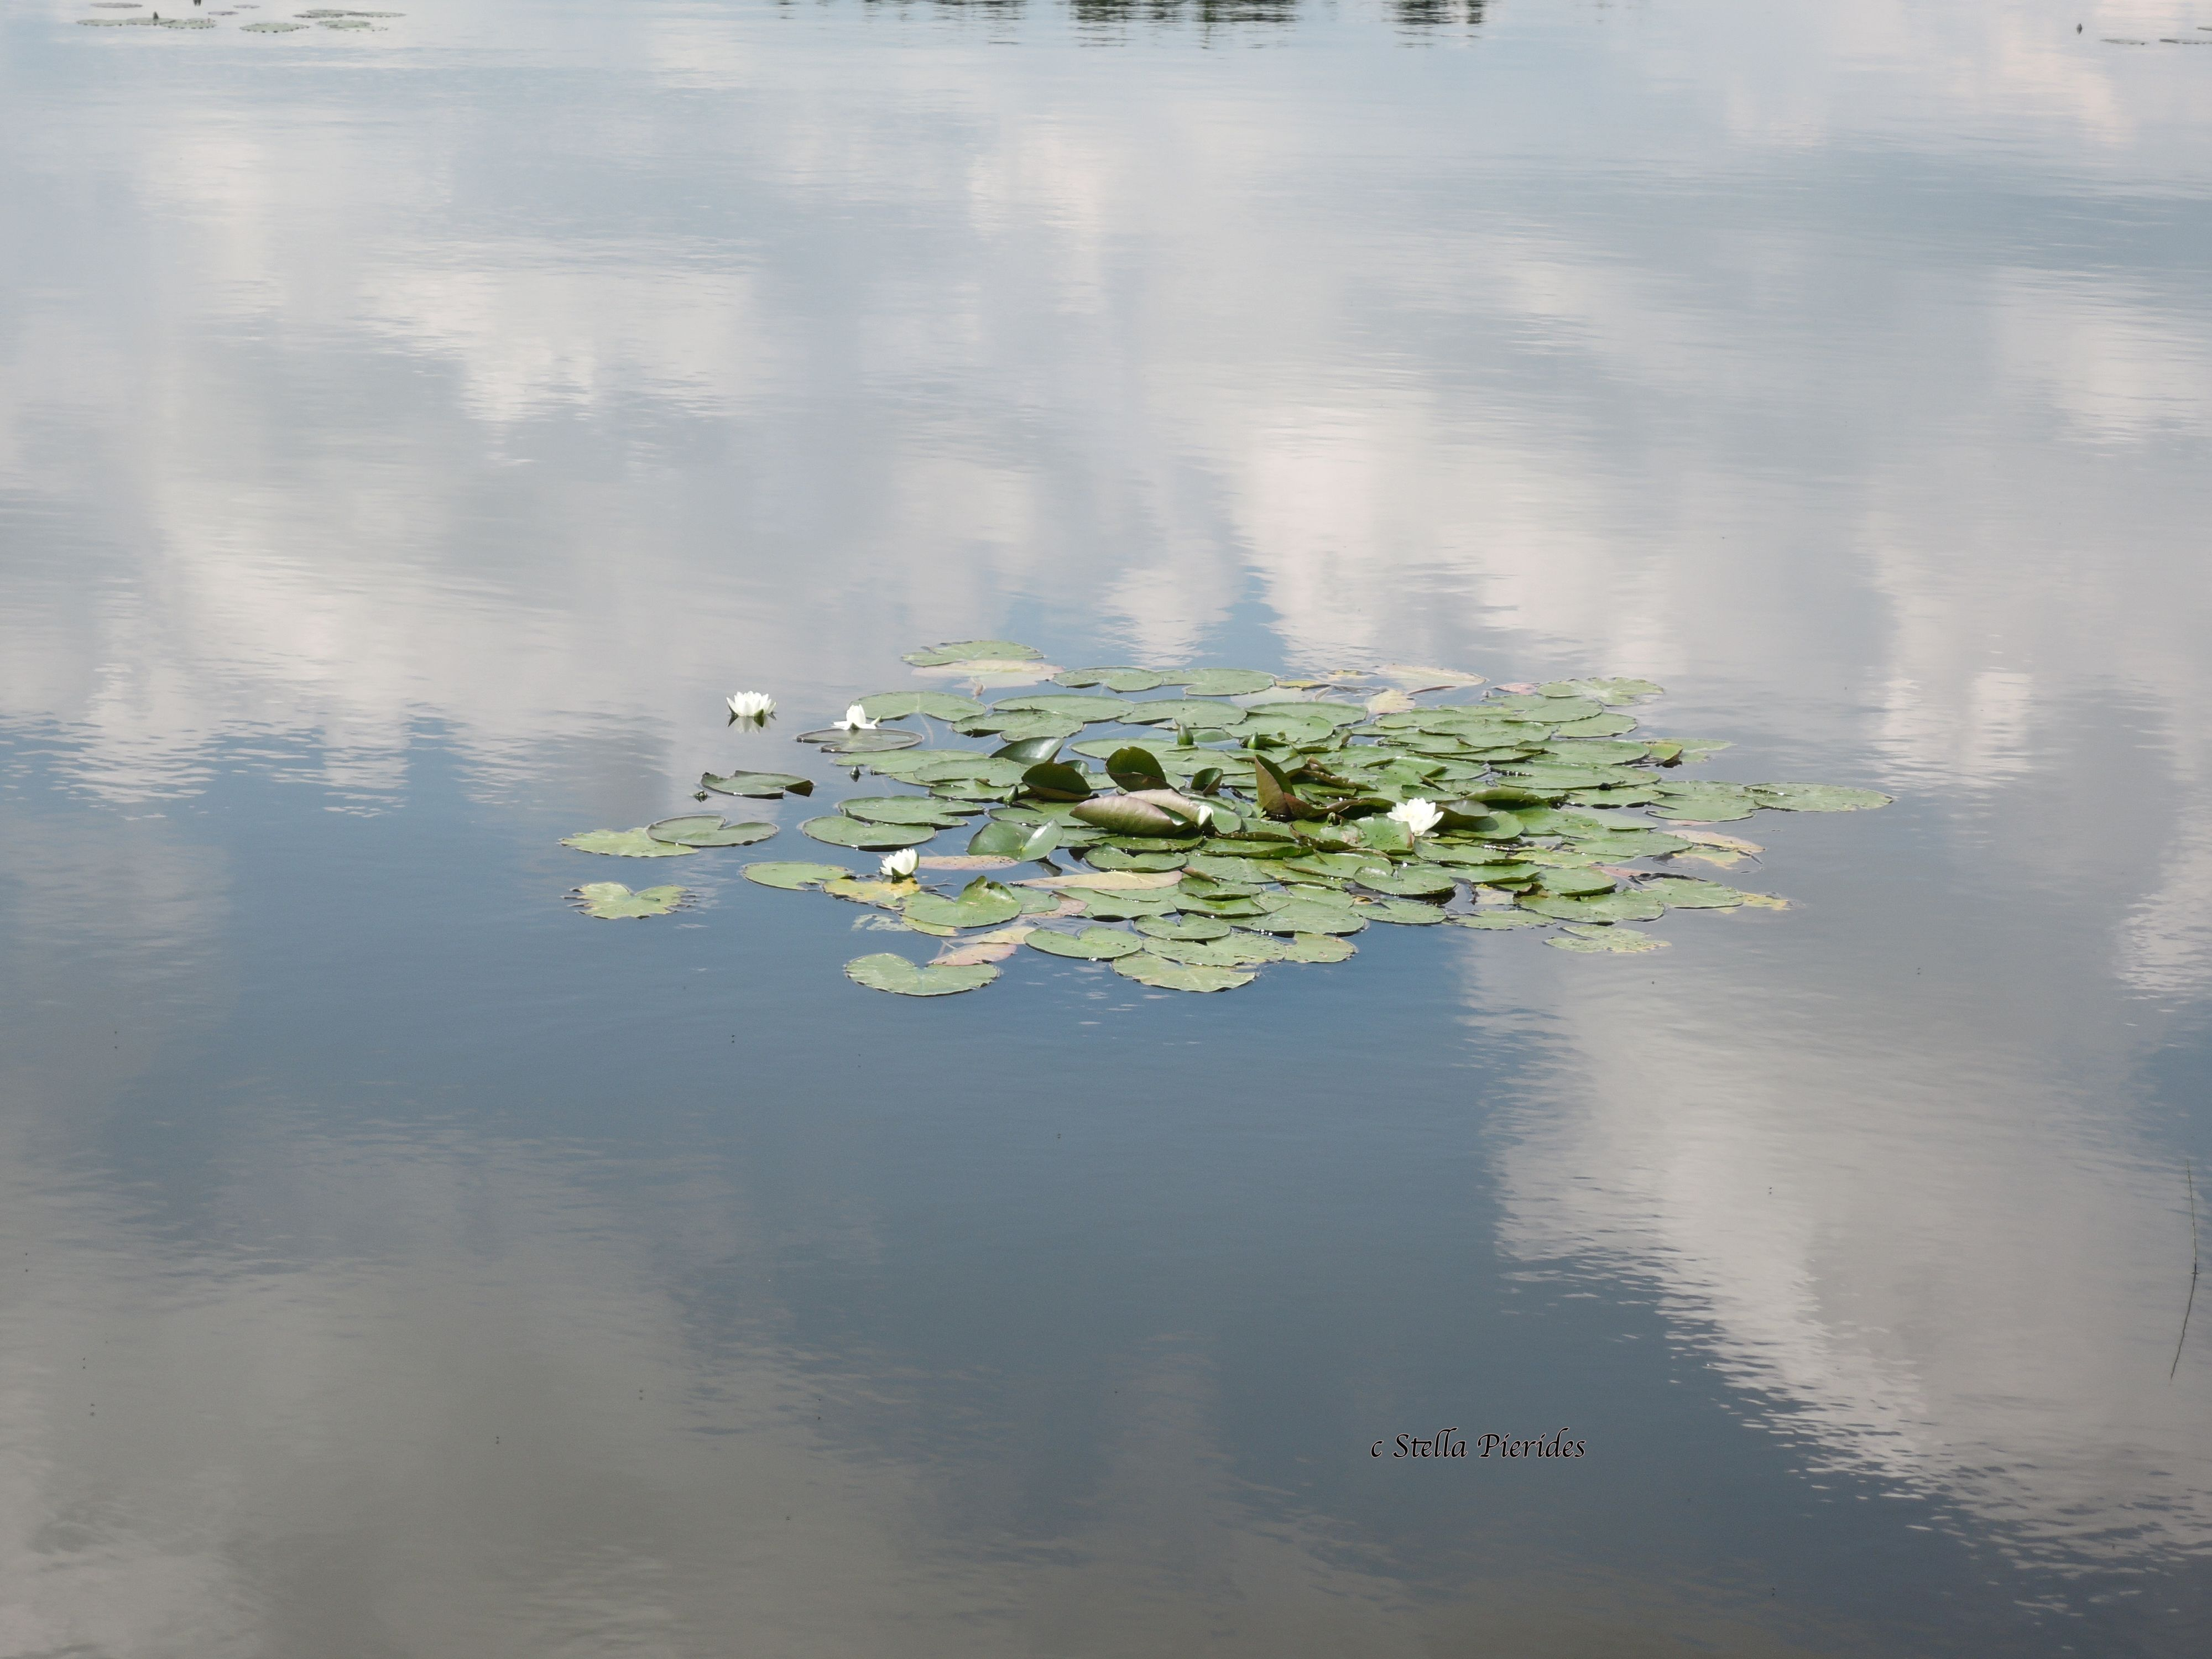 water lilies,lake,